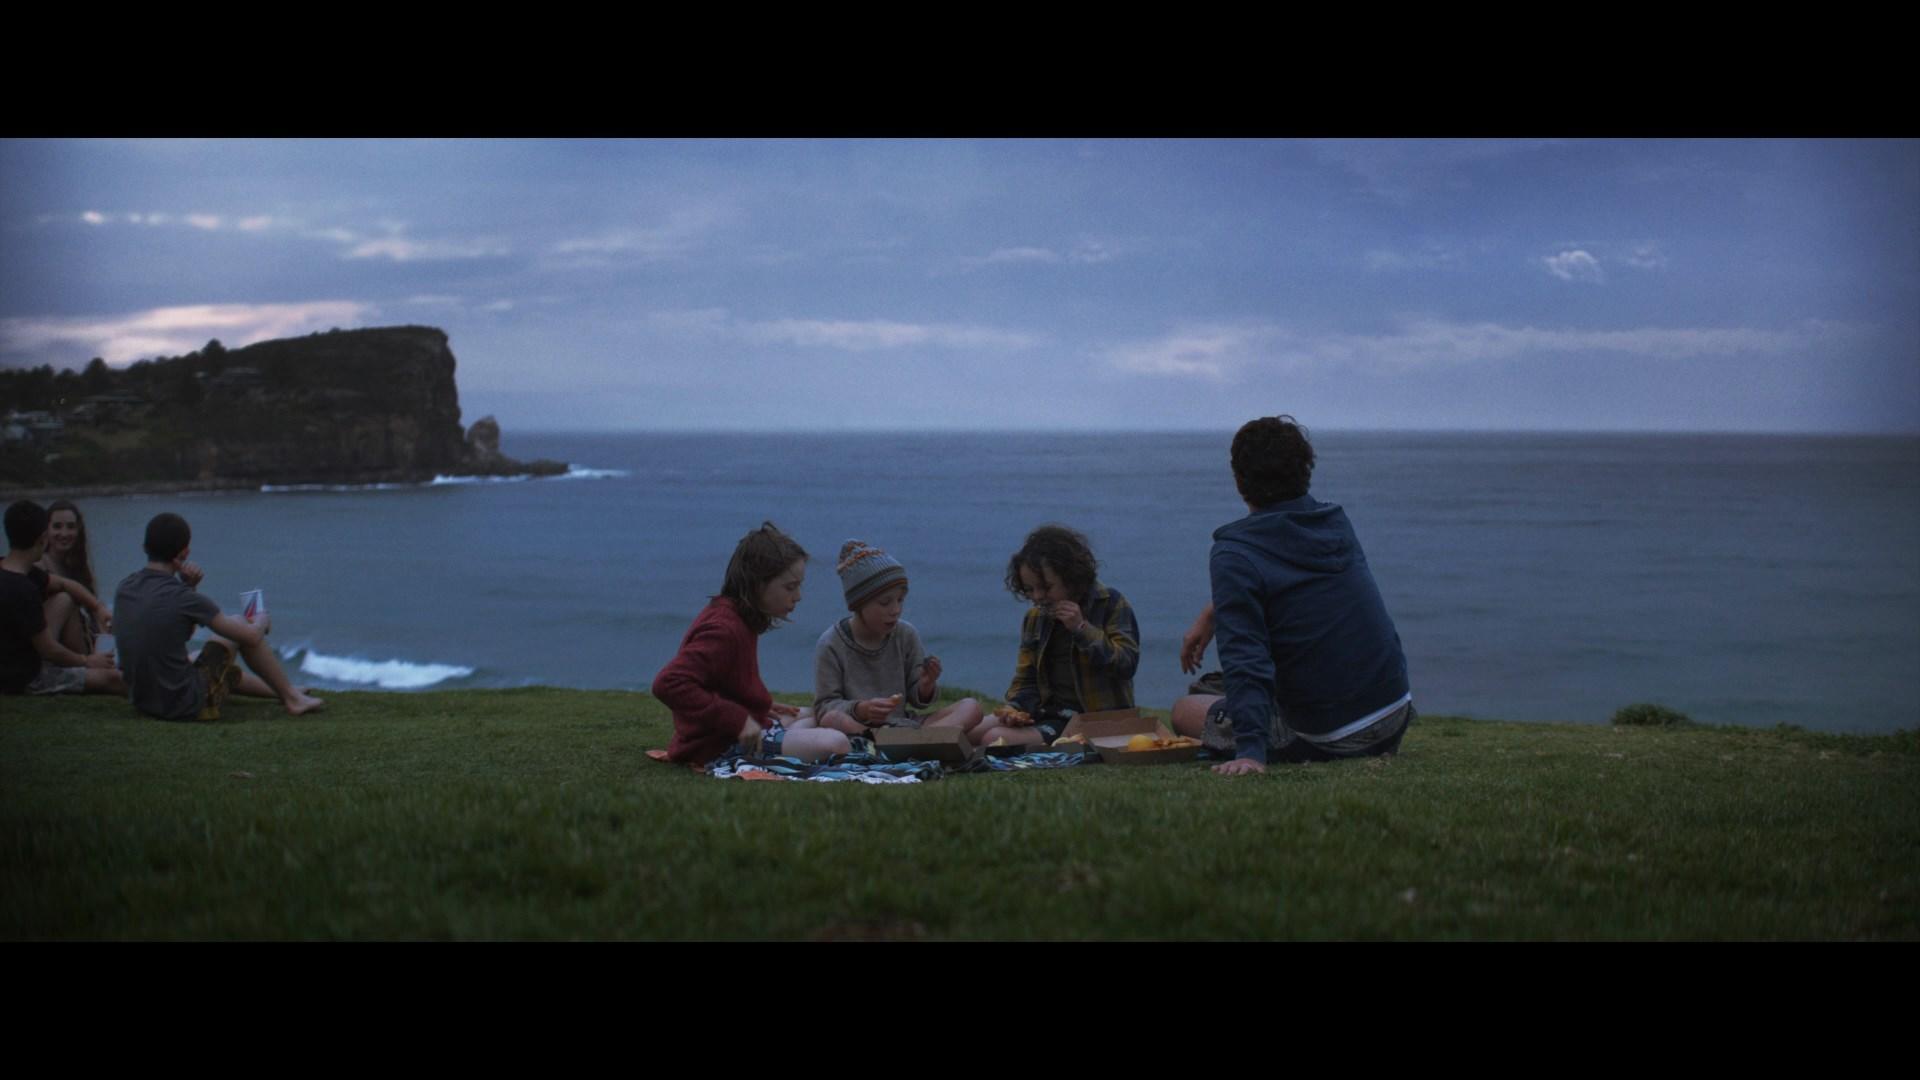 Un milagro inesperado (2020) 1080p BDrip Latino